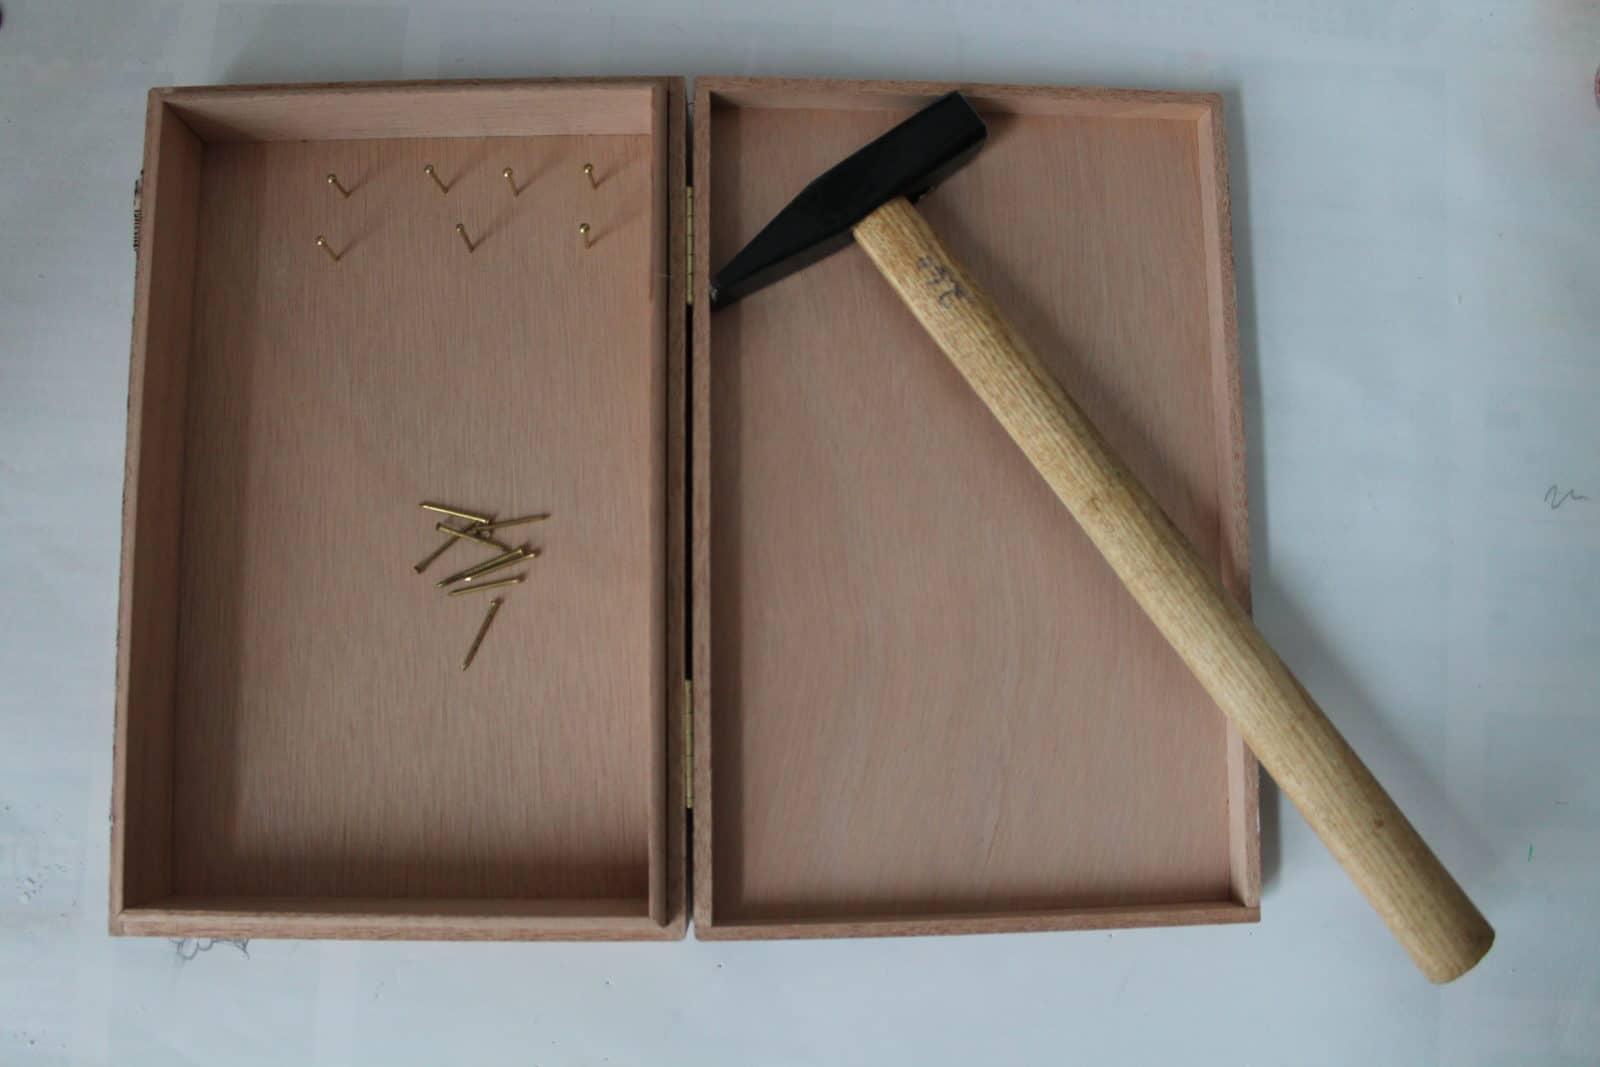 holzbox upgrade zum wand schmuckk stchen handmade kultur. Black Bedroom Furniture Sets. Home Design Ideas